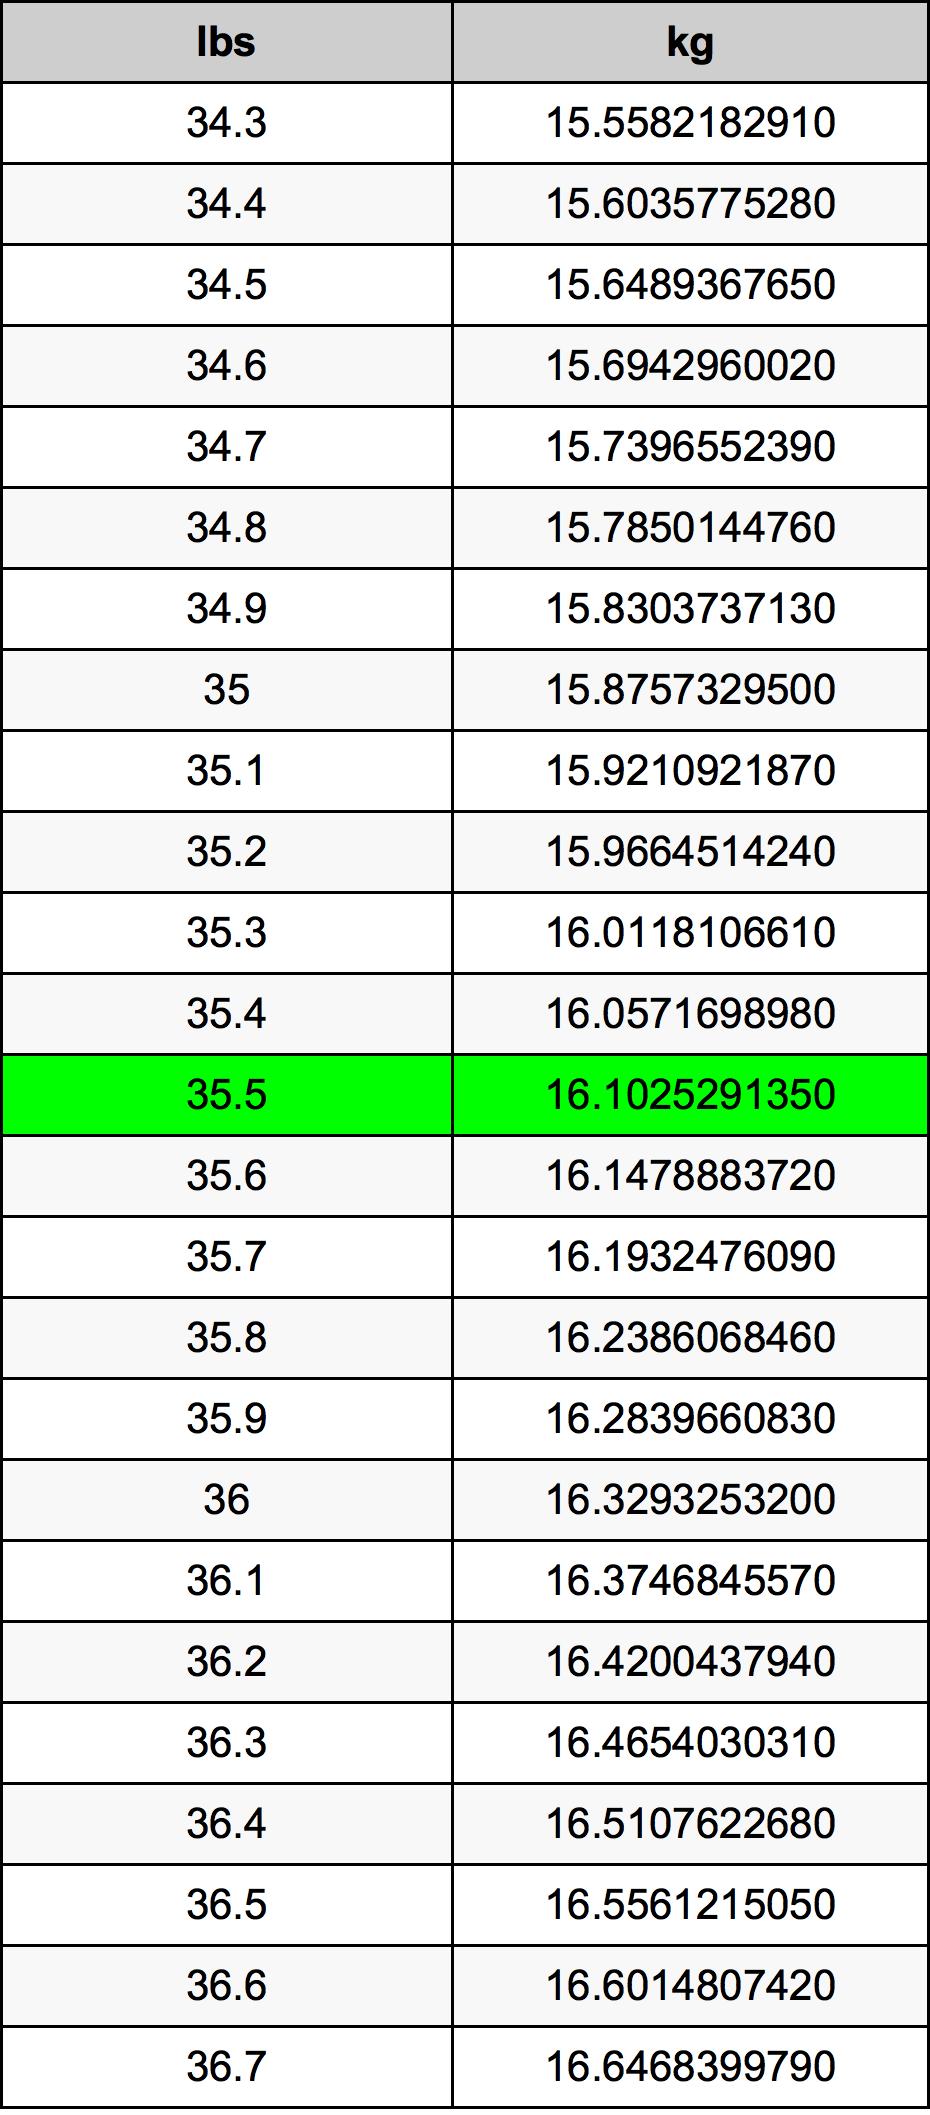 35.5 Libra konverteringstabellen